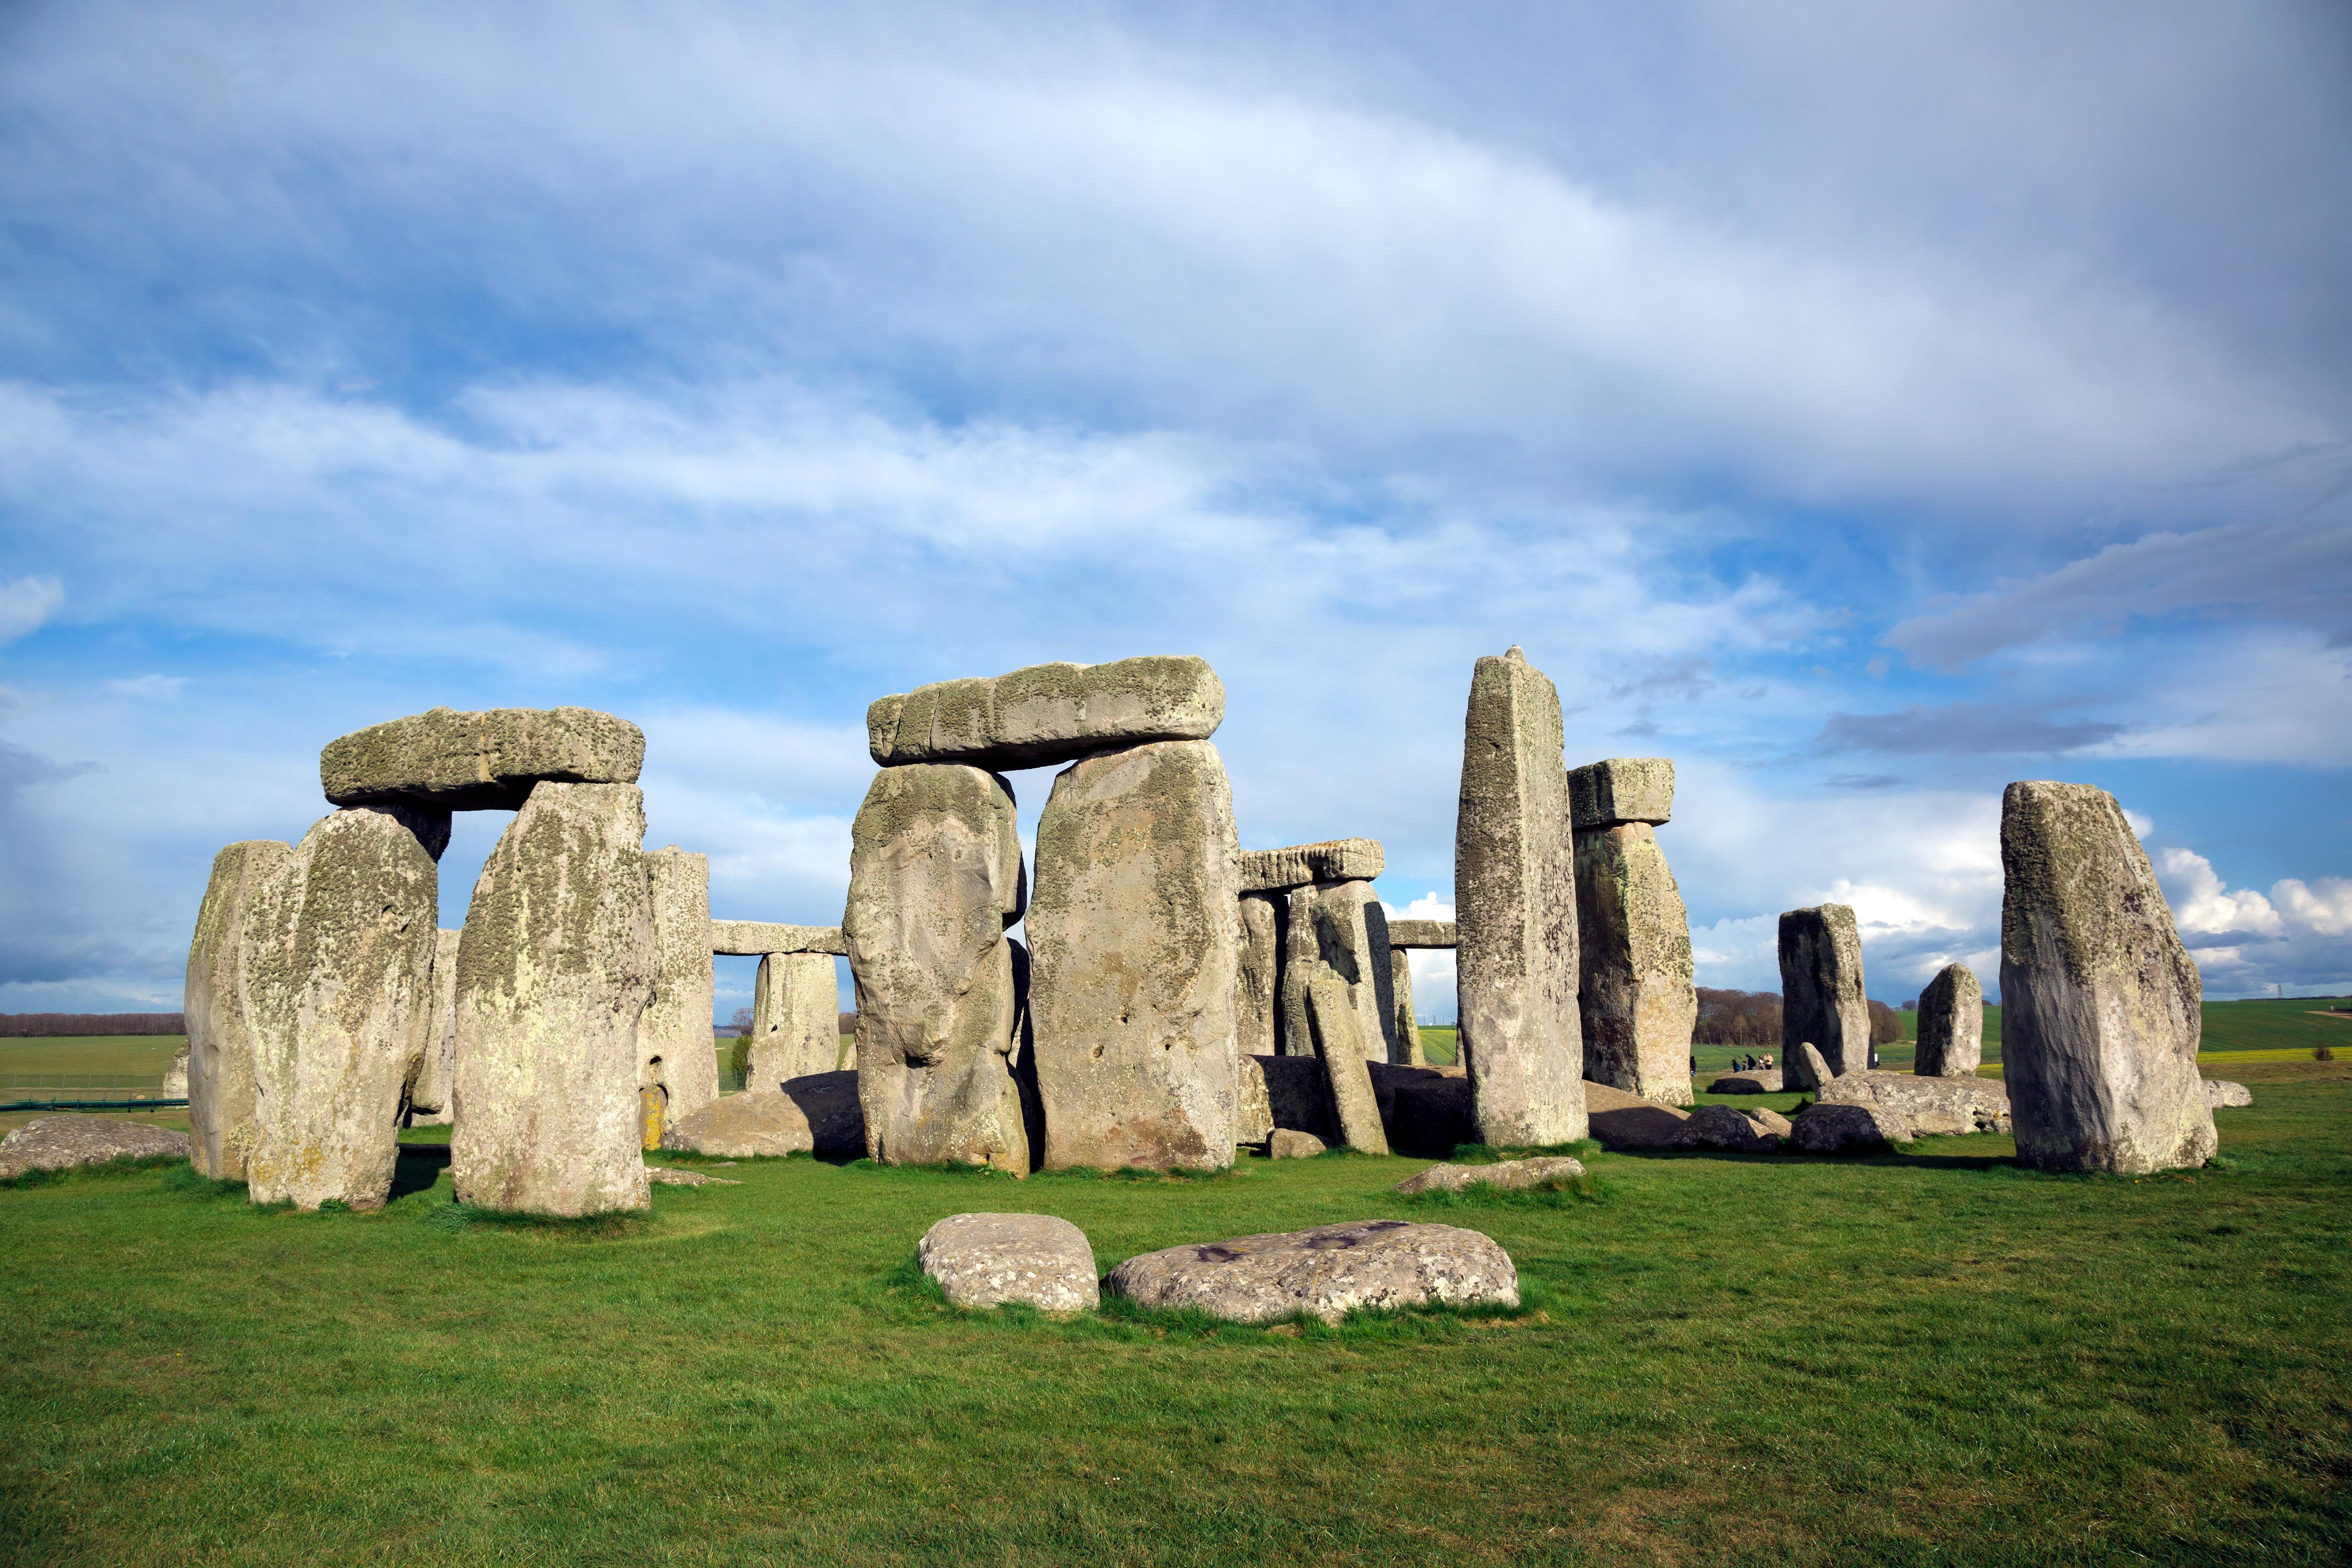 Stonehenge was built circa 3700 and 1600 BCE, according to UNESCO.